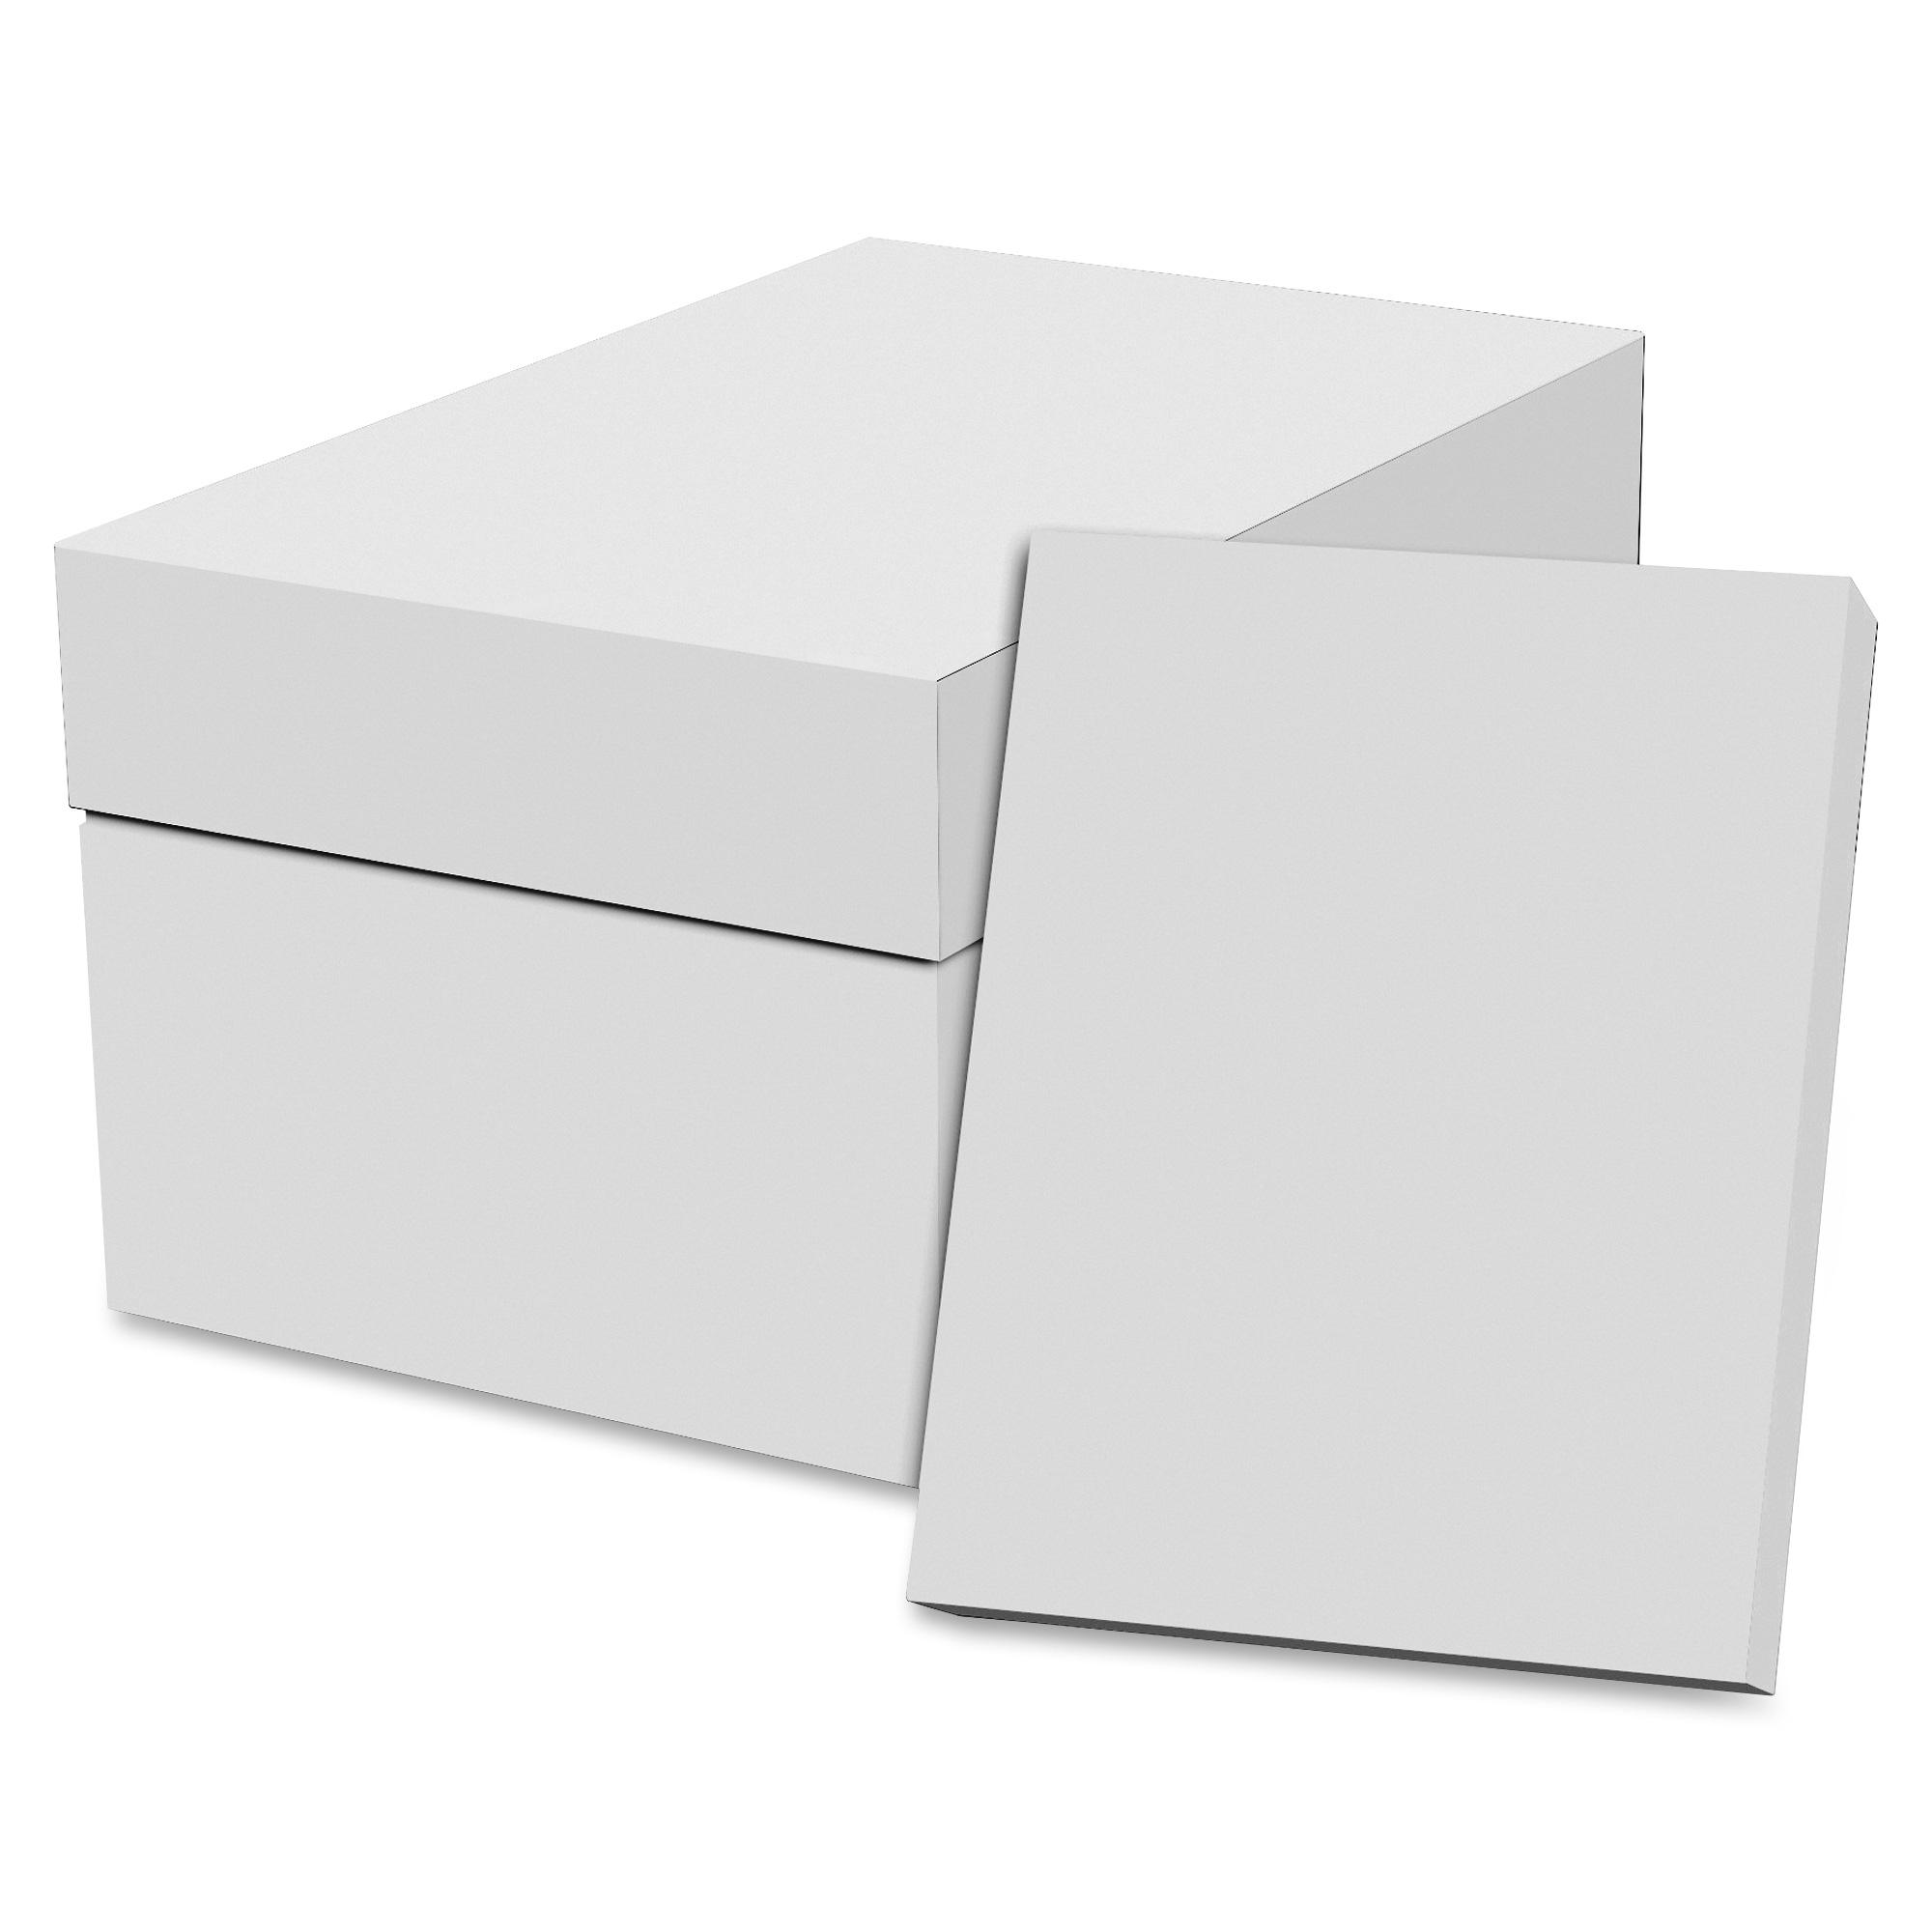 Special Buy 92 Brightness Copy Paper